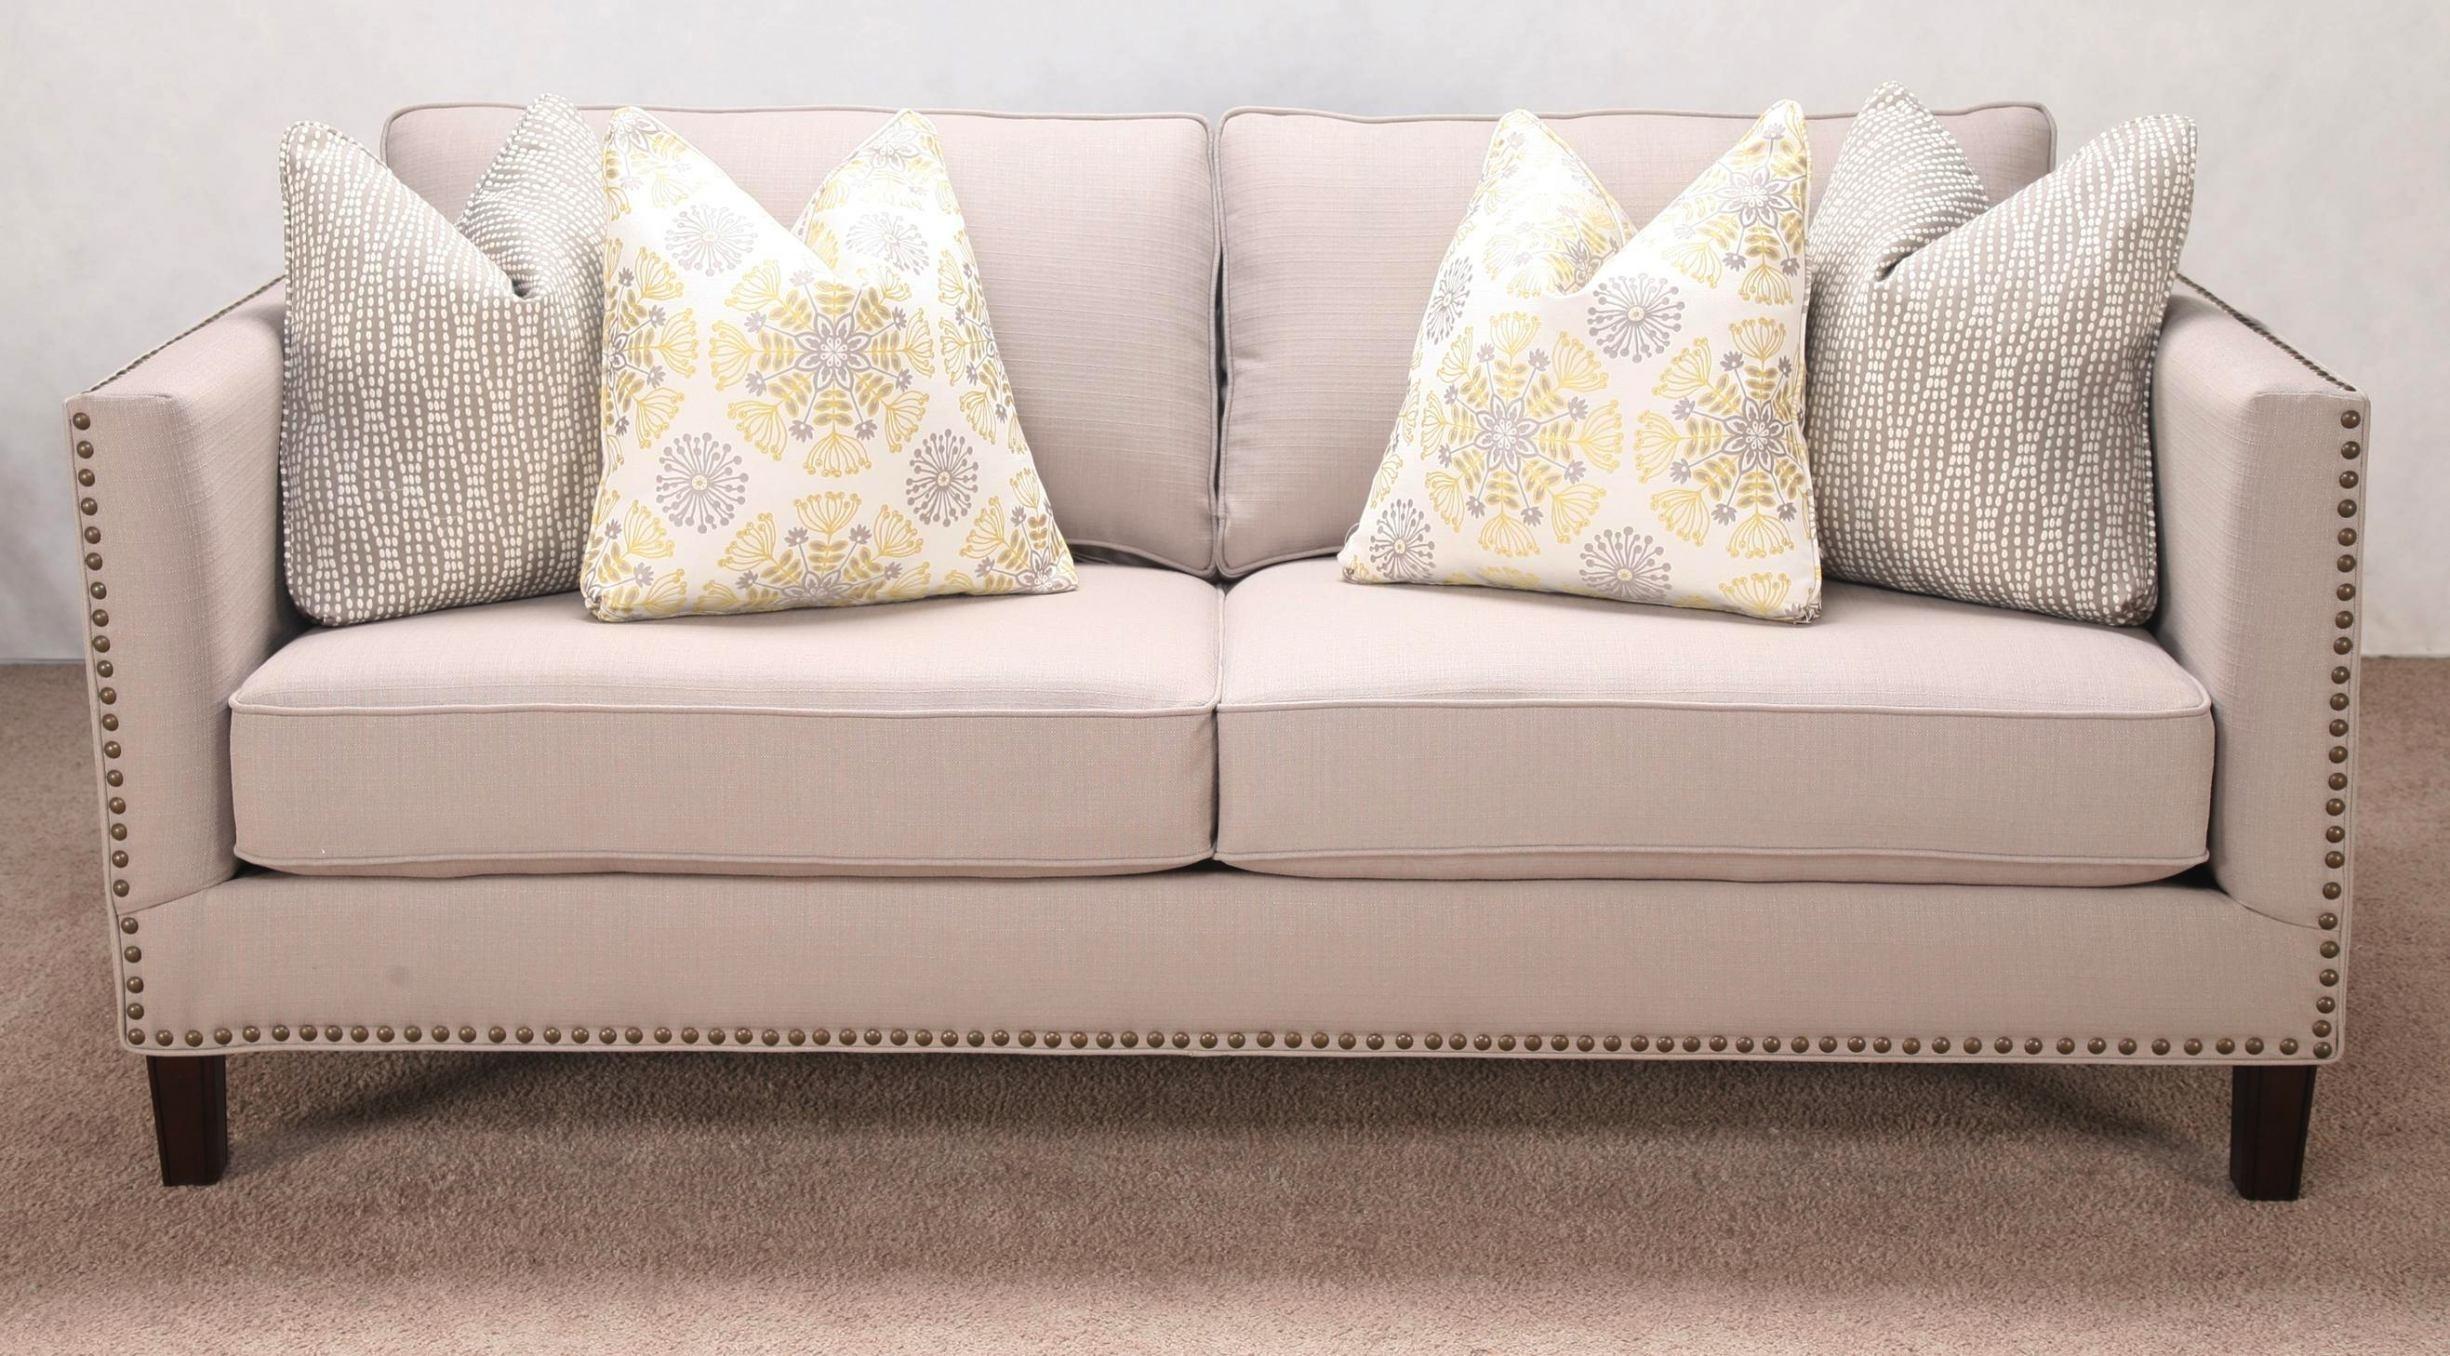 Unique Sectional Sofa With Nailhead Trim 26 About Remodel Sofa Table for Sectional Sofas With Nailhead Trim